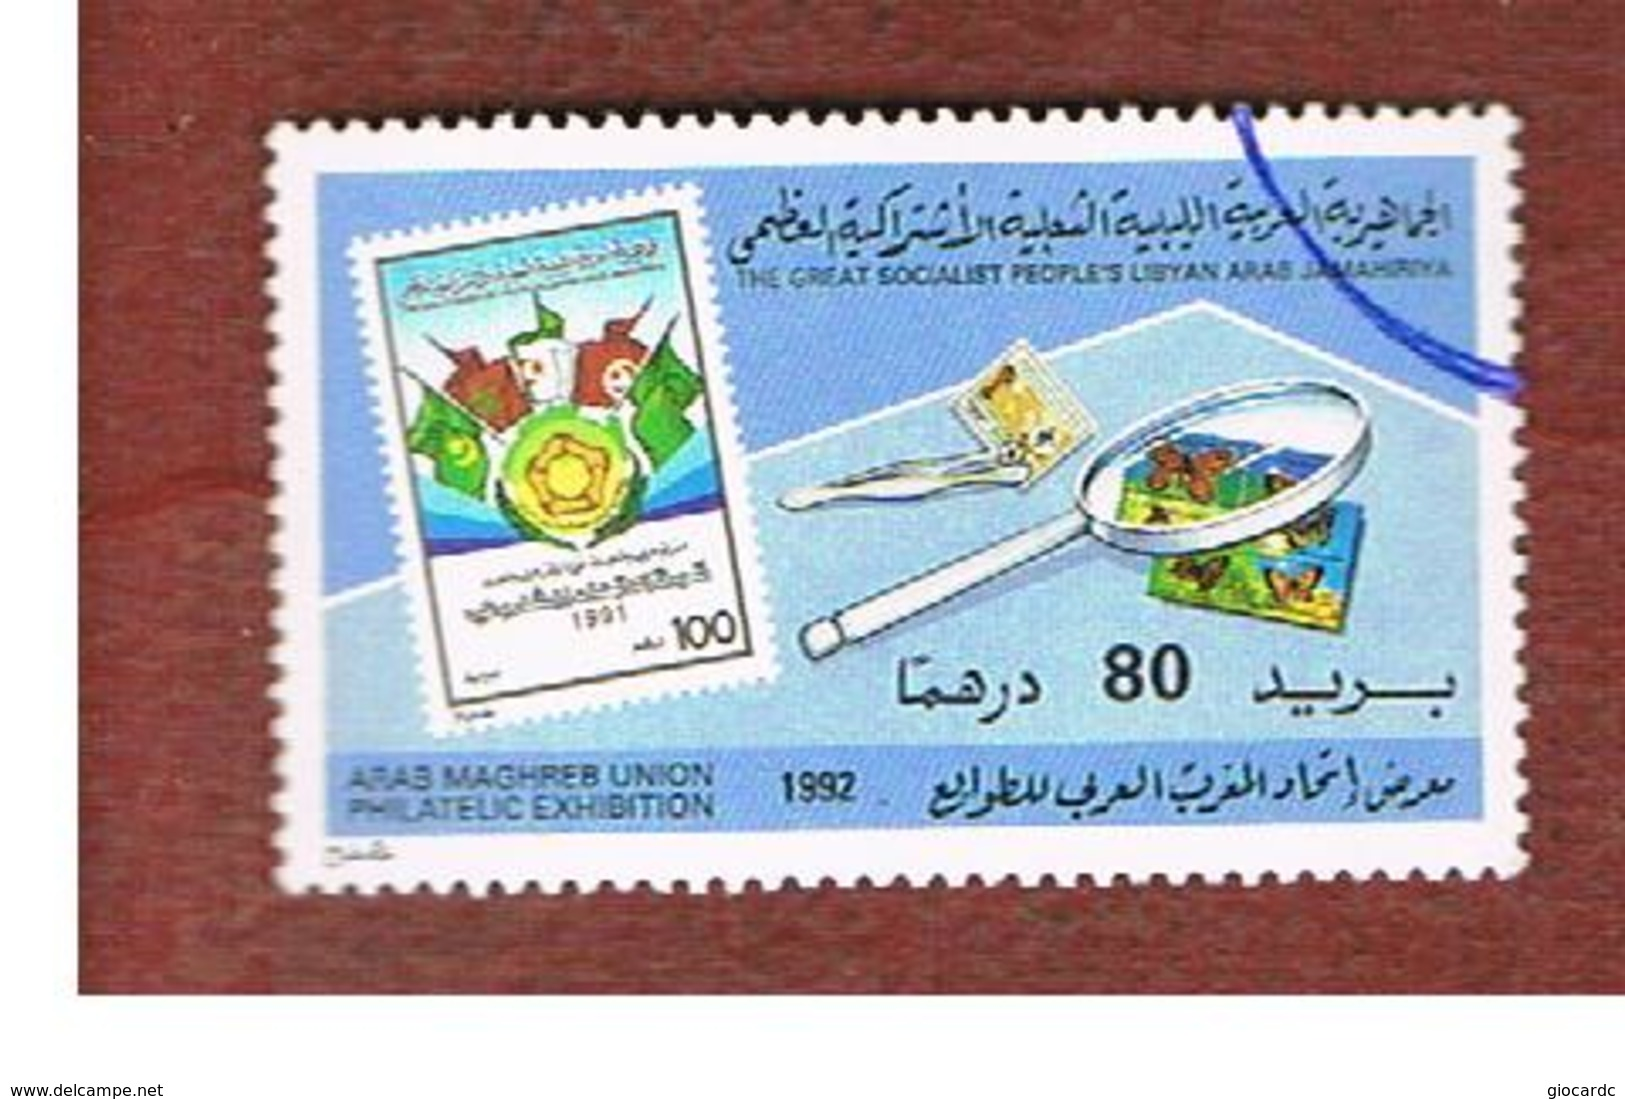 LIBIA (LIBYA) -  SG 2069  -     1992  ARAB MAGHREB UNION -  USED - Libia